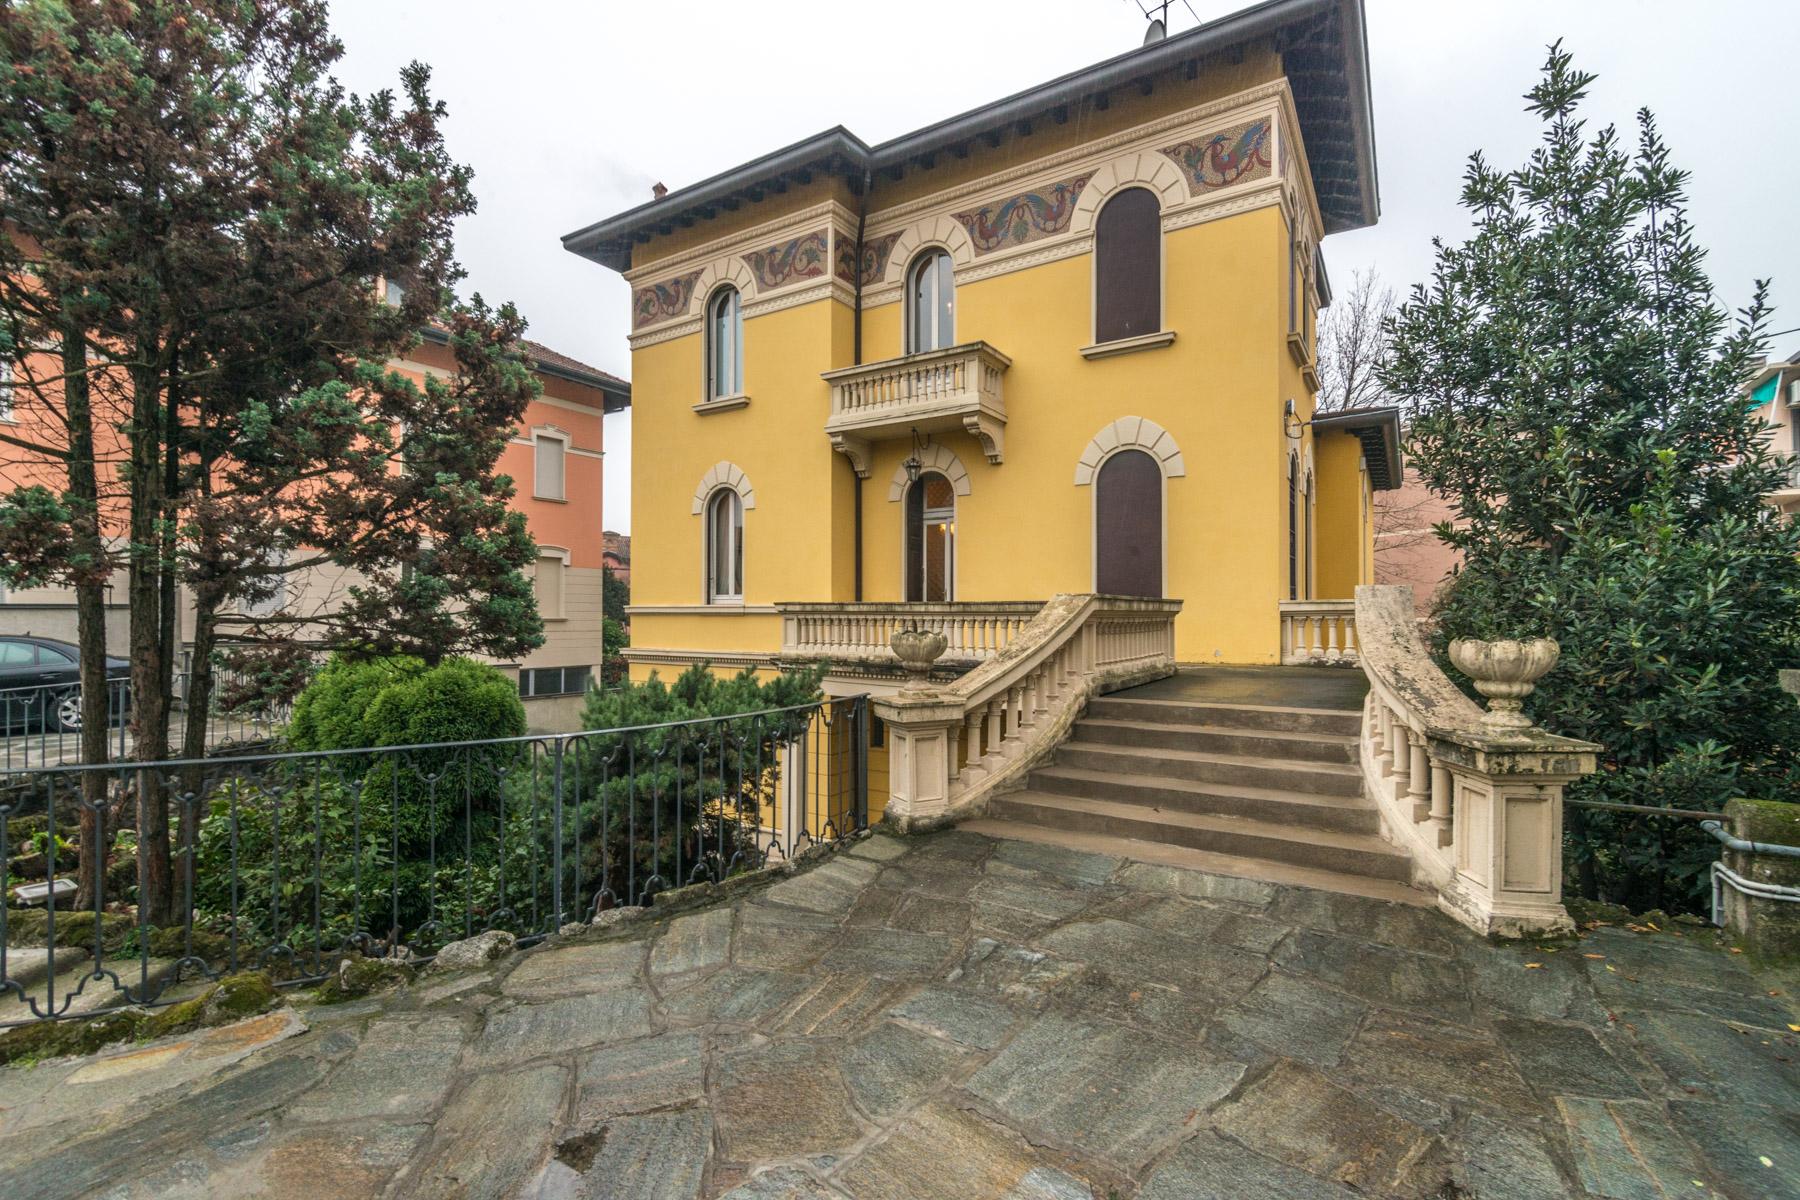 Villa in Vendita a Pavia via viale gorizia